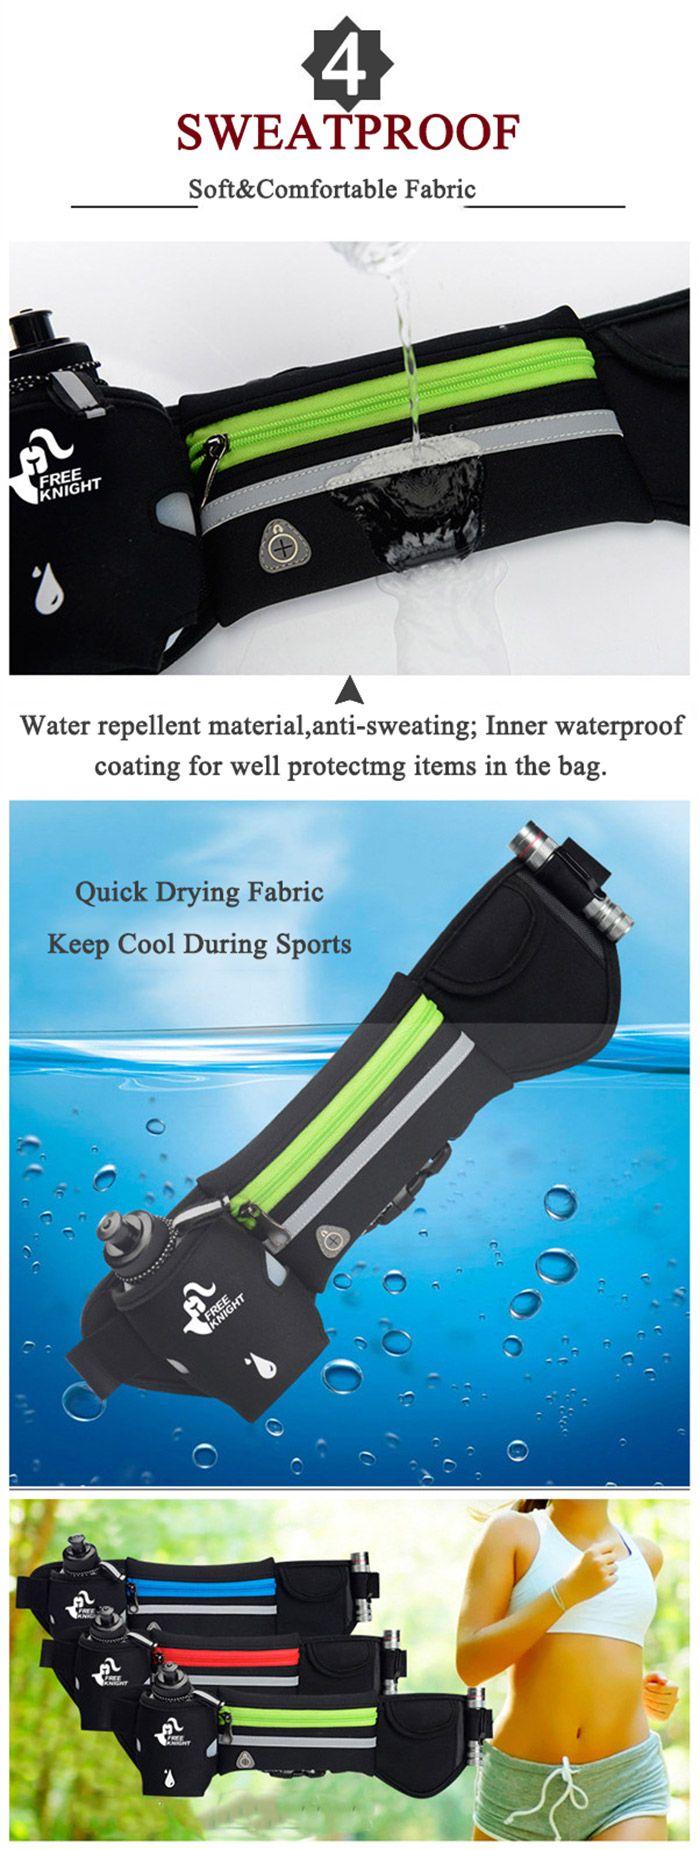 Freeknight Headphone Jack Reflective Waist Bag with One Water Bottle